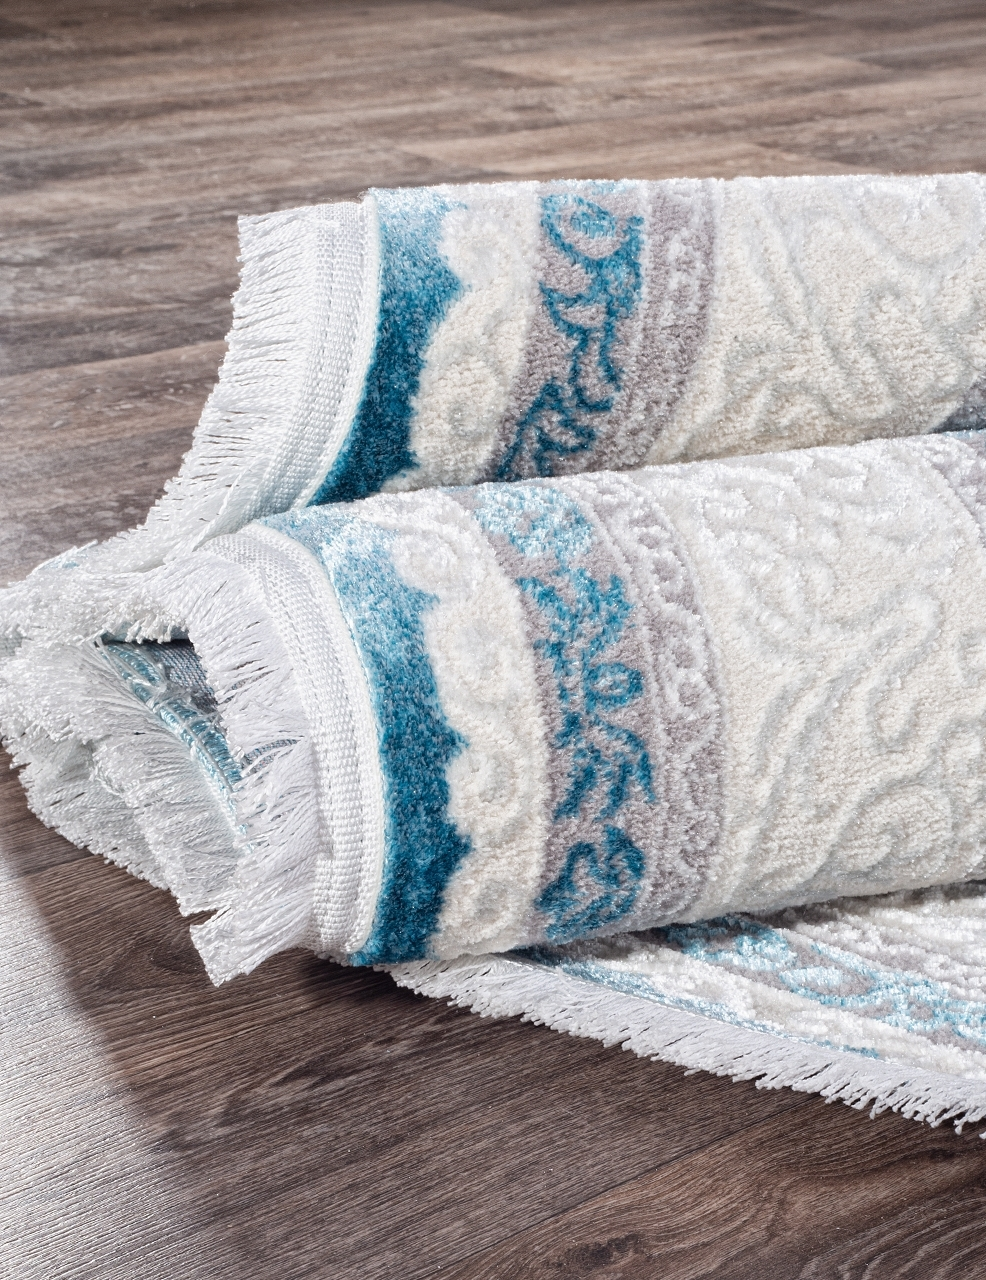 Ковер 0T249RG - BLUE / BLUE - Овал - коллекция ALFANI - фото 3